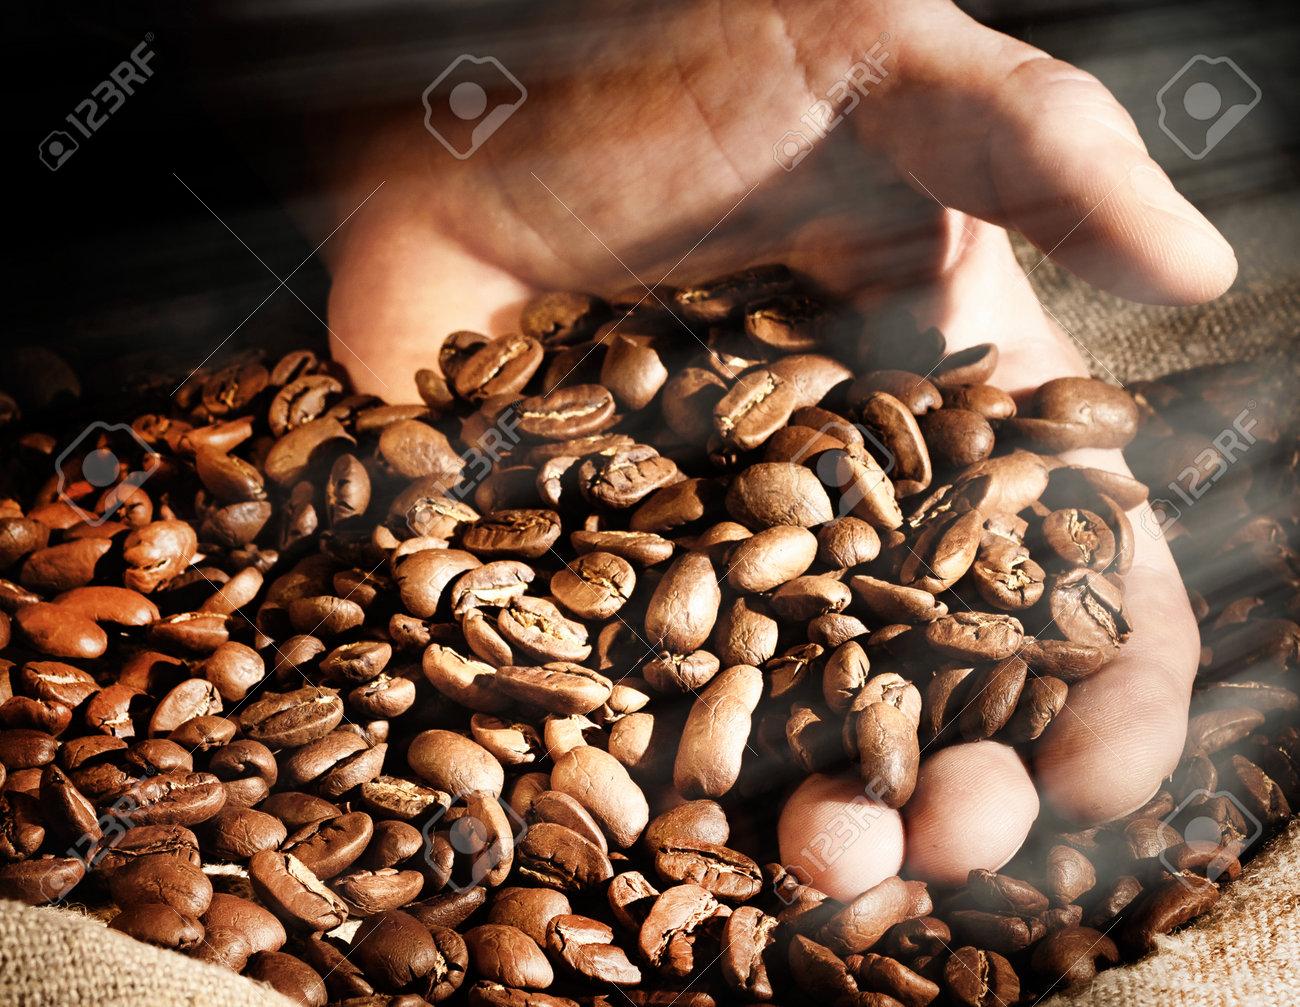 Coffee beans in hand on dark background. - 171765777